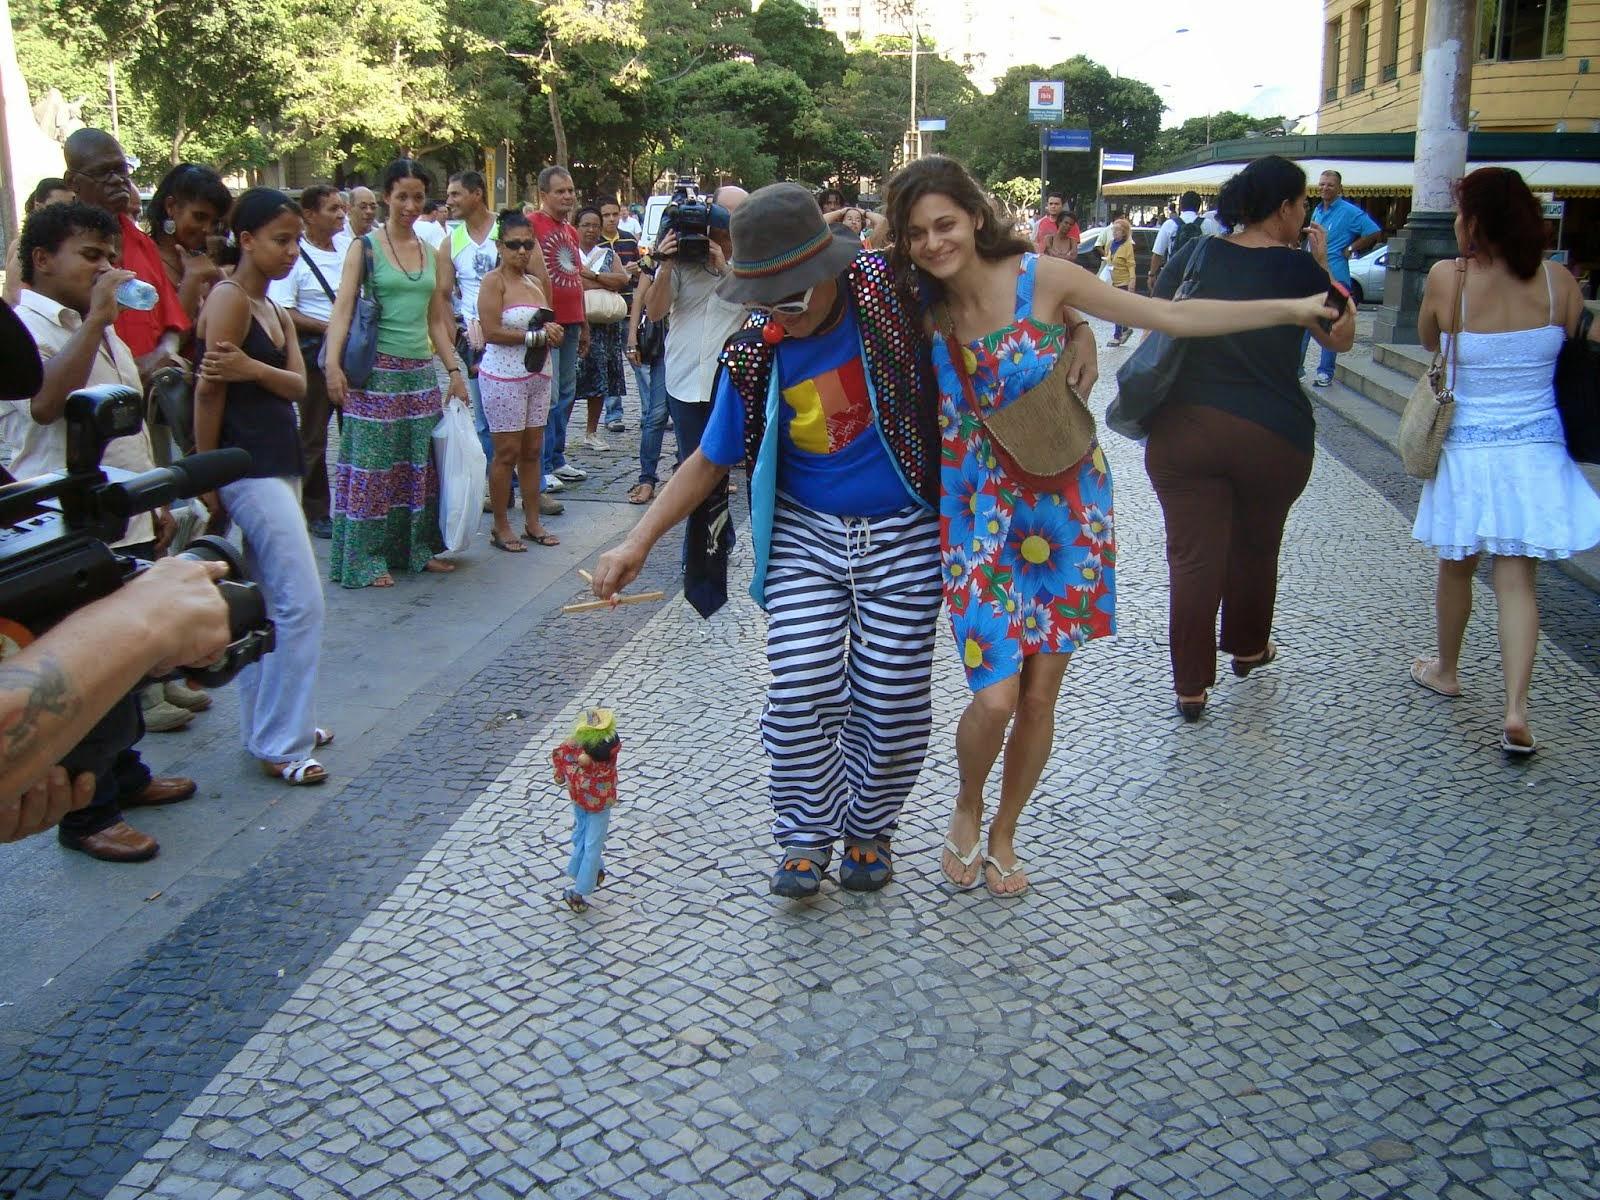 DIA DA CULTURA / 2007/ CINELÂNDIA - RJ